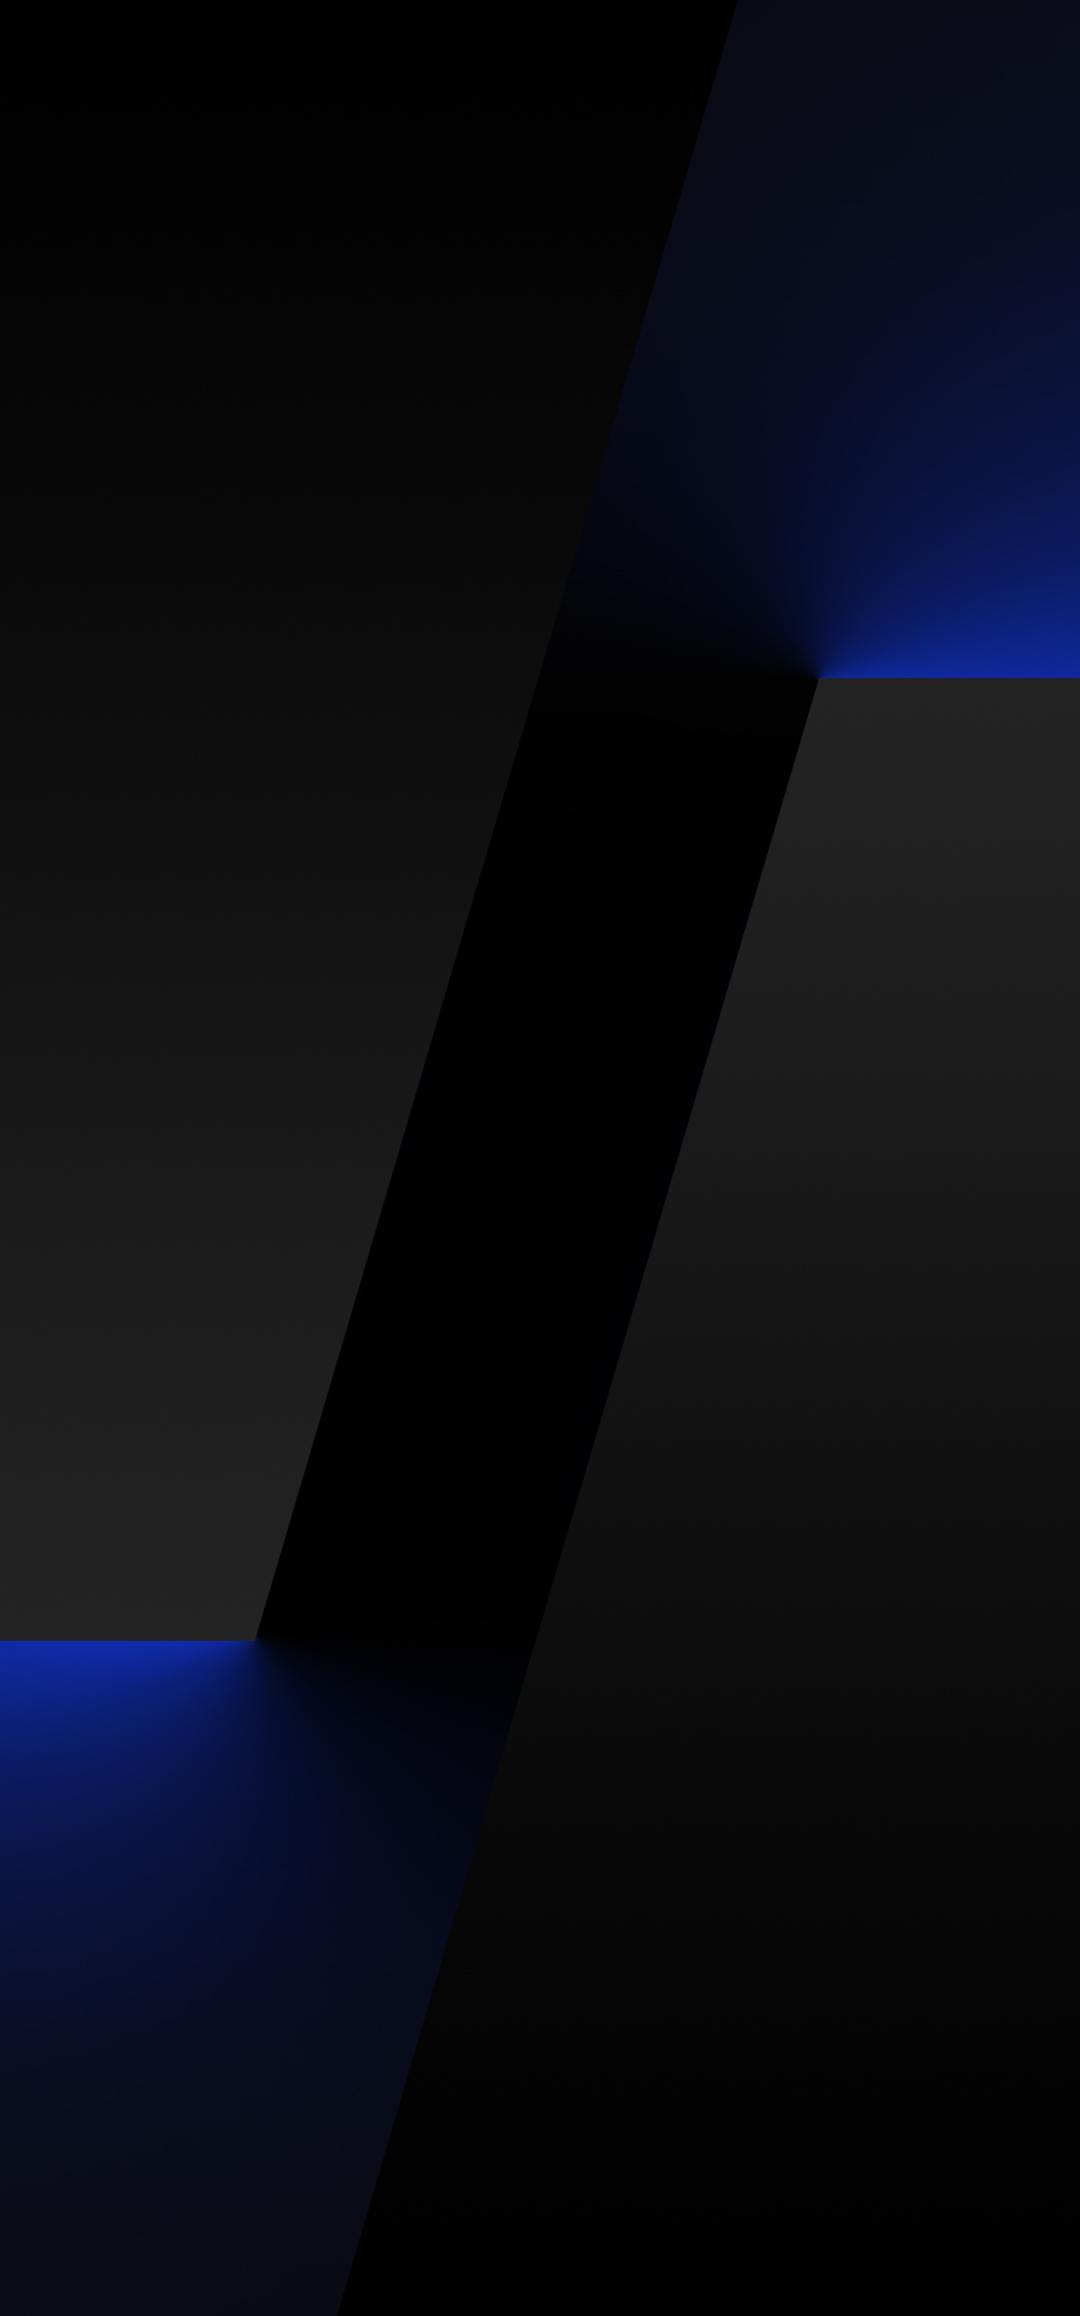 Download Vivo Nex Stock Wallpapers (16 FHD+ Wallpapers) | DroidViews